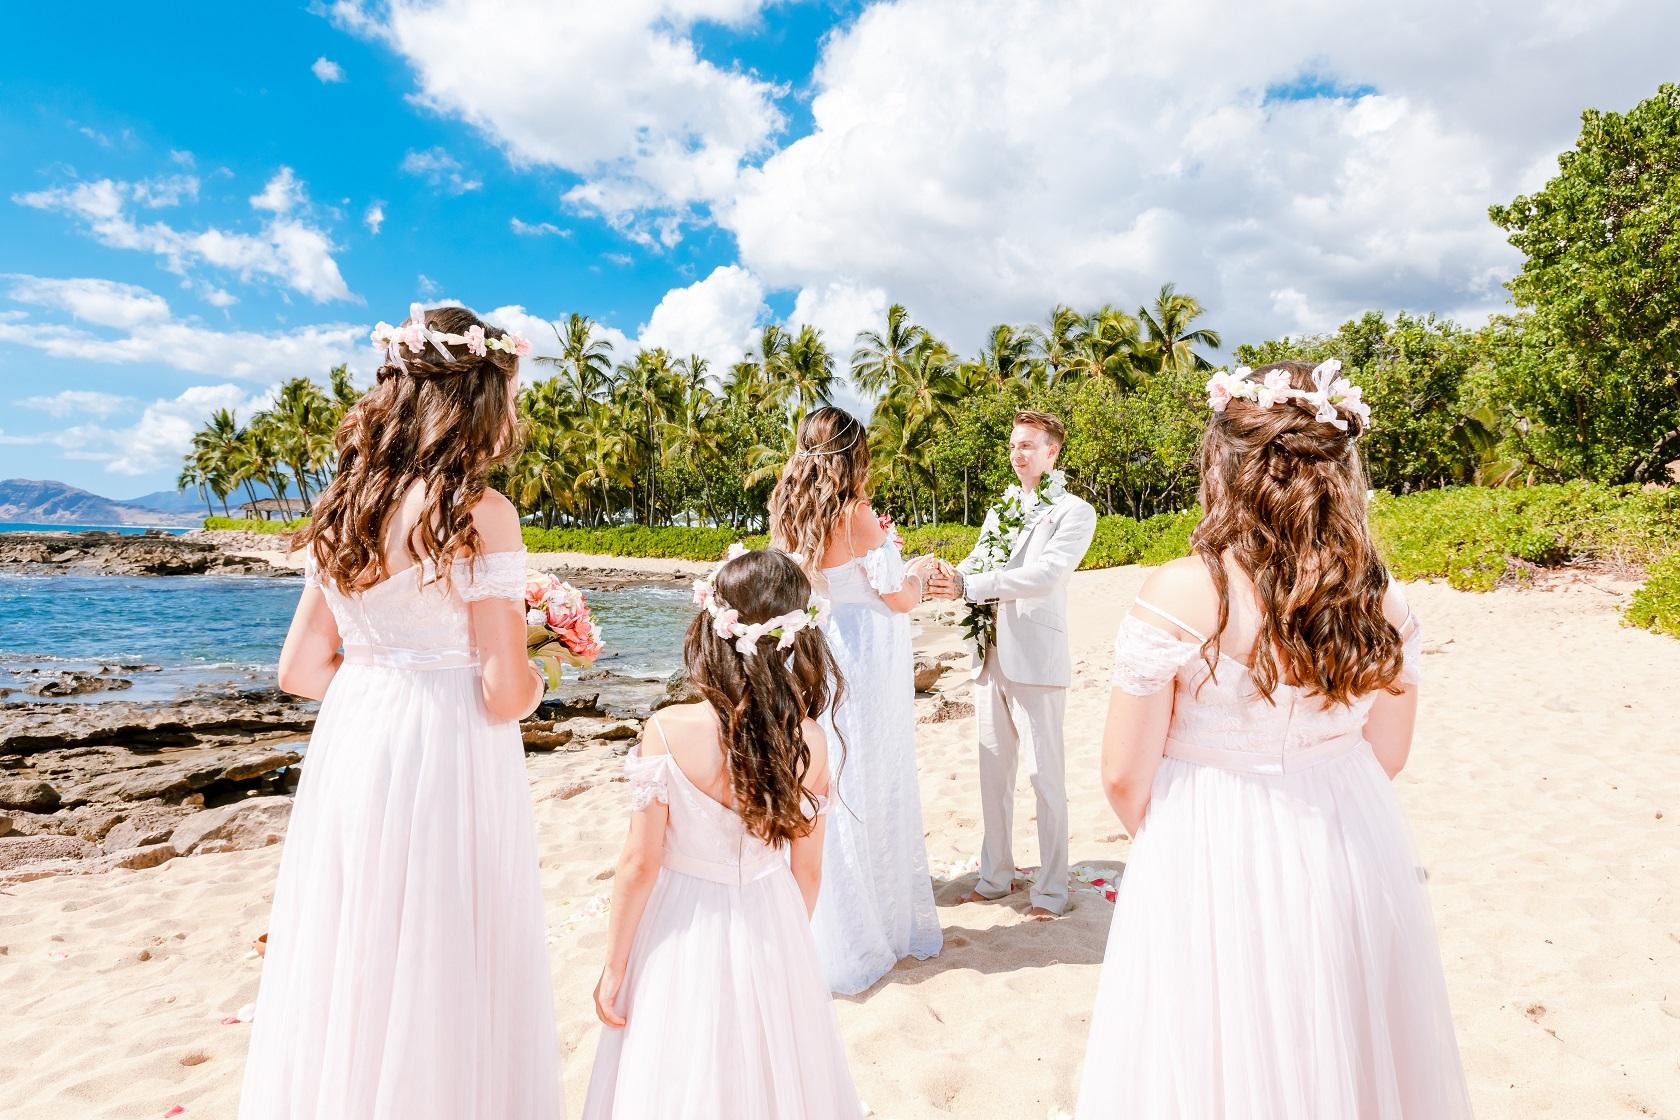 sunny oahu hawaii wedding day beach ceremony flower girls